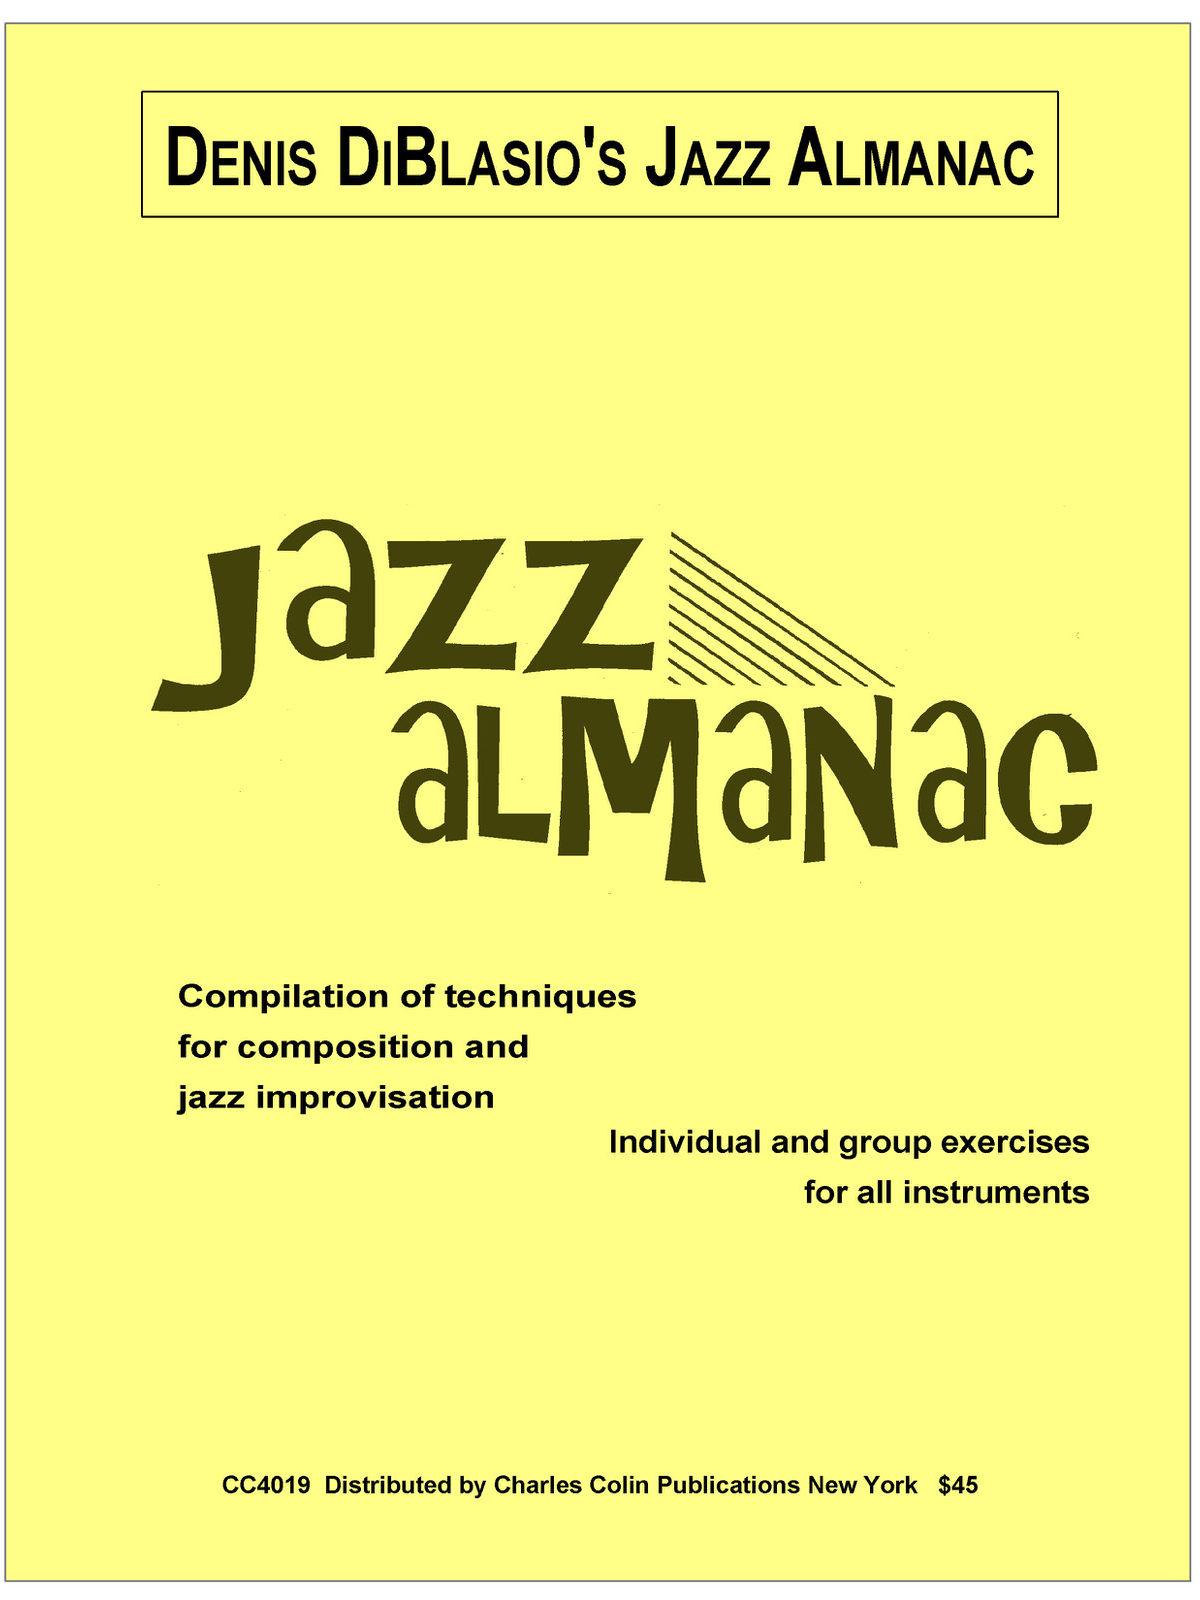 DiBlasio, Jazz Almanac Complete